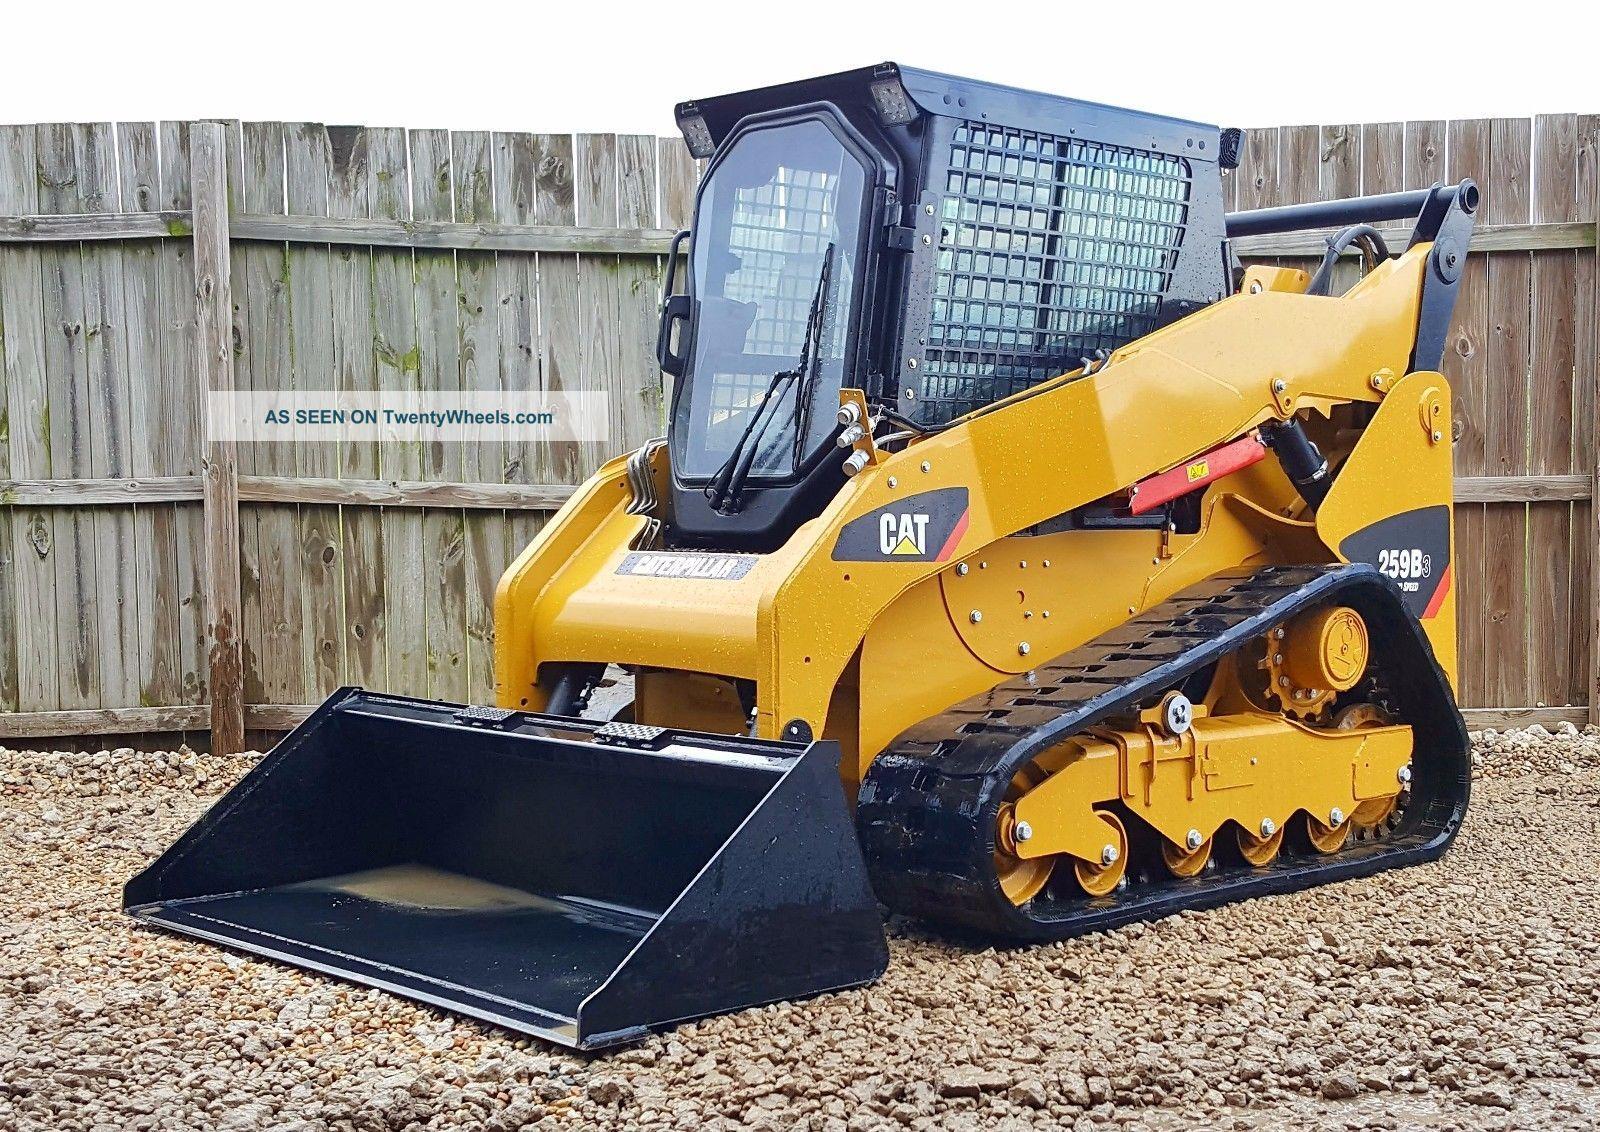 Track Skid Steer Loader : Caterpillar cat b air heat mph compact track